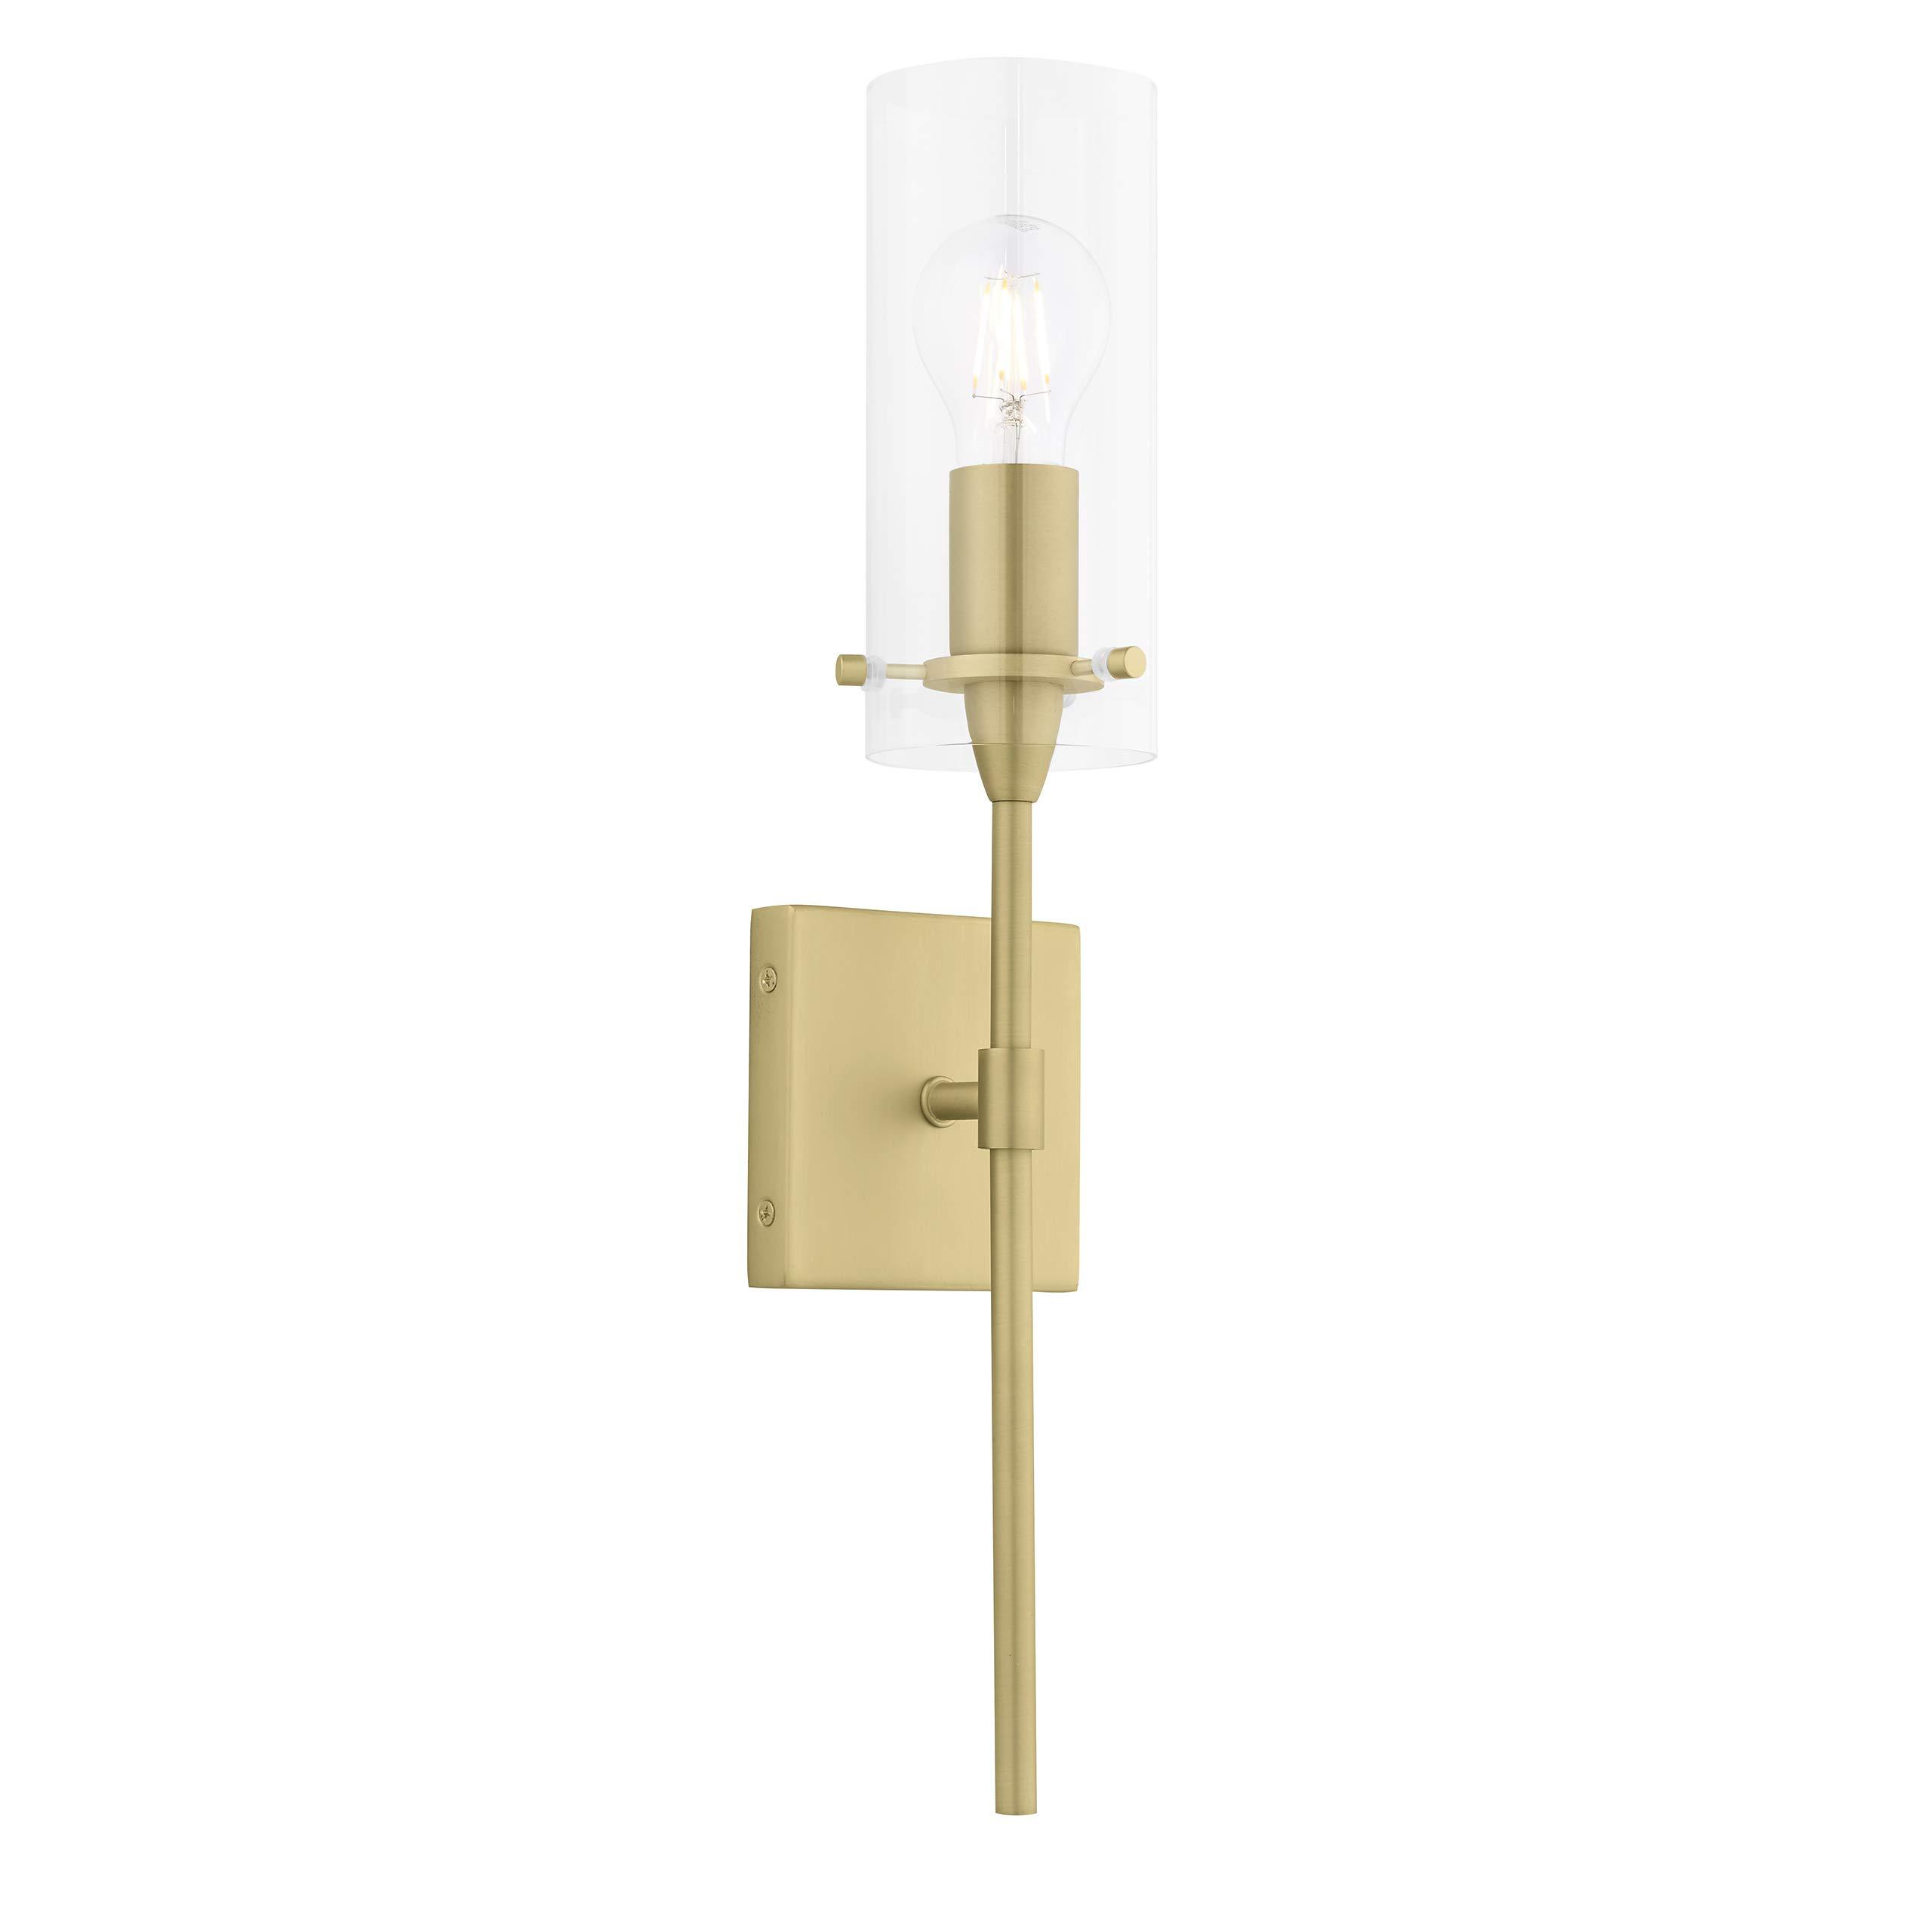 Effimero Wall Sconce | Satin Brass Vanity Light Fixture LL-WL31-SB